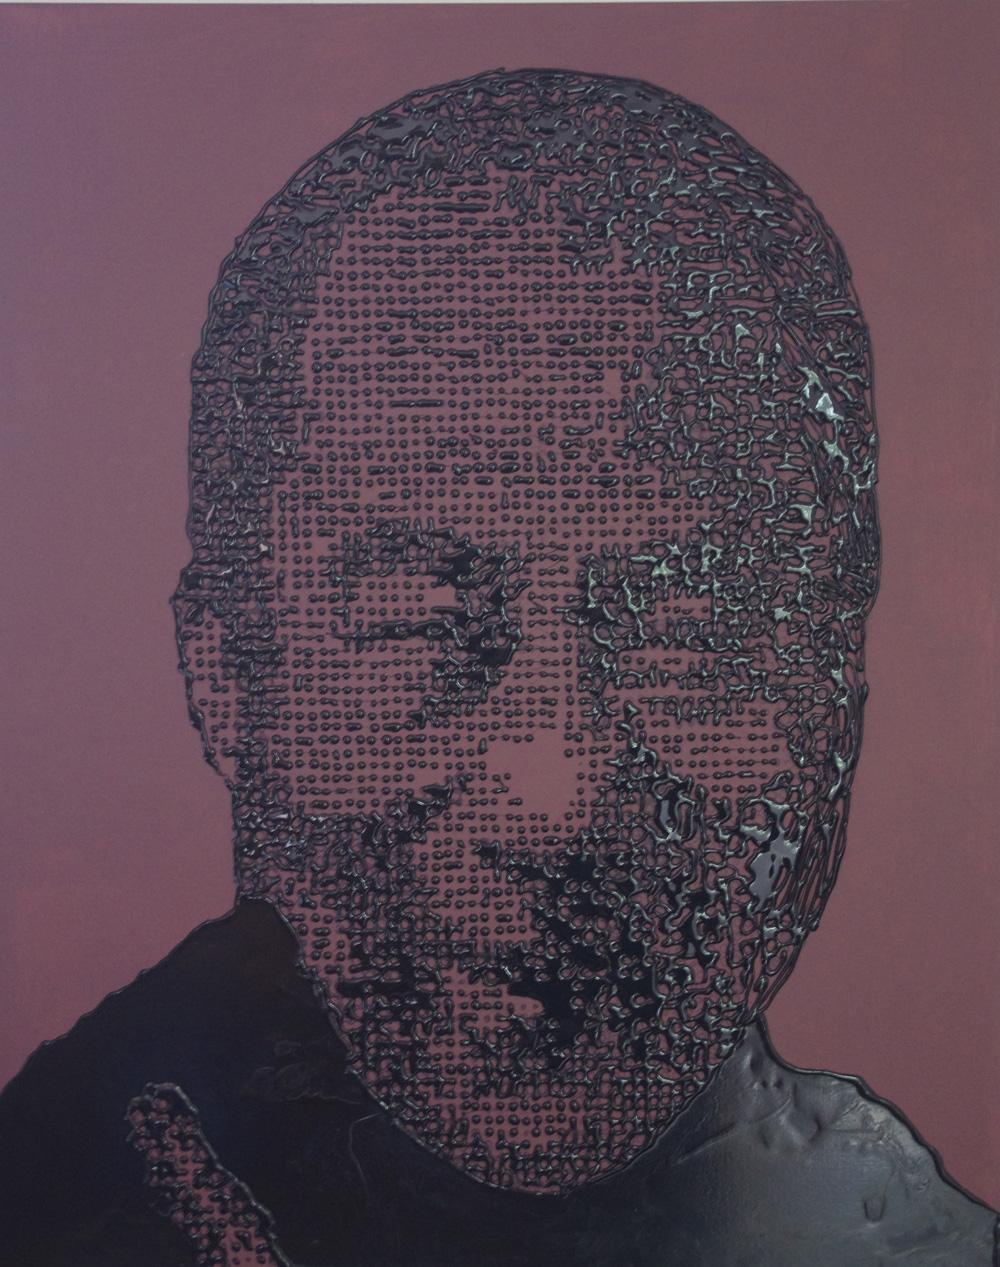 Alessandro Artizzu - Dalai Lama (Tenzin Gyatso)